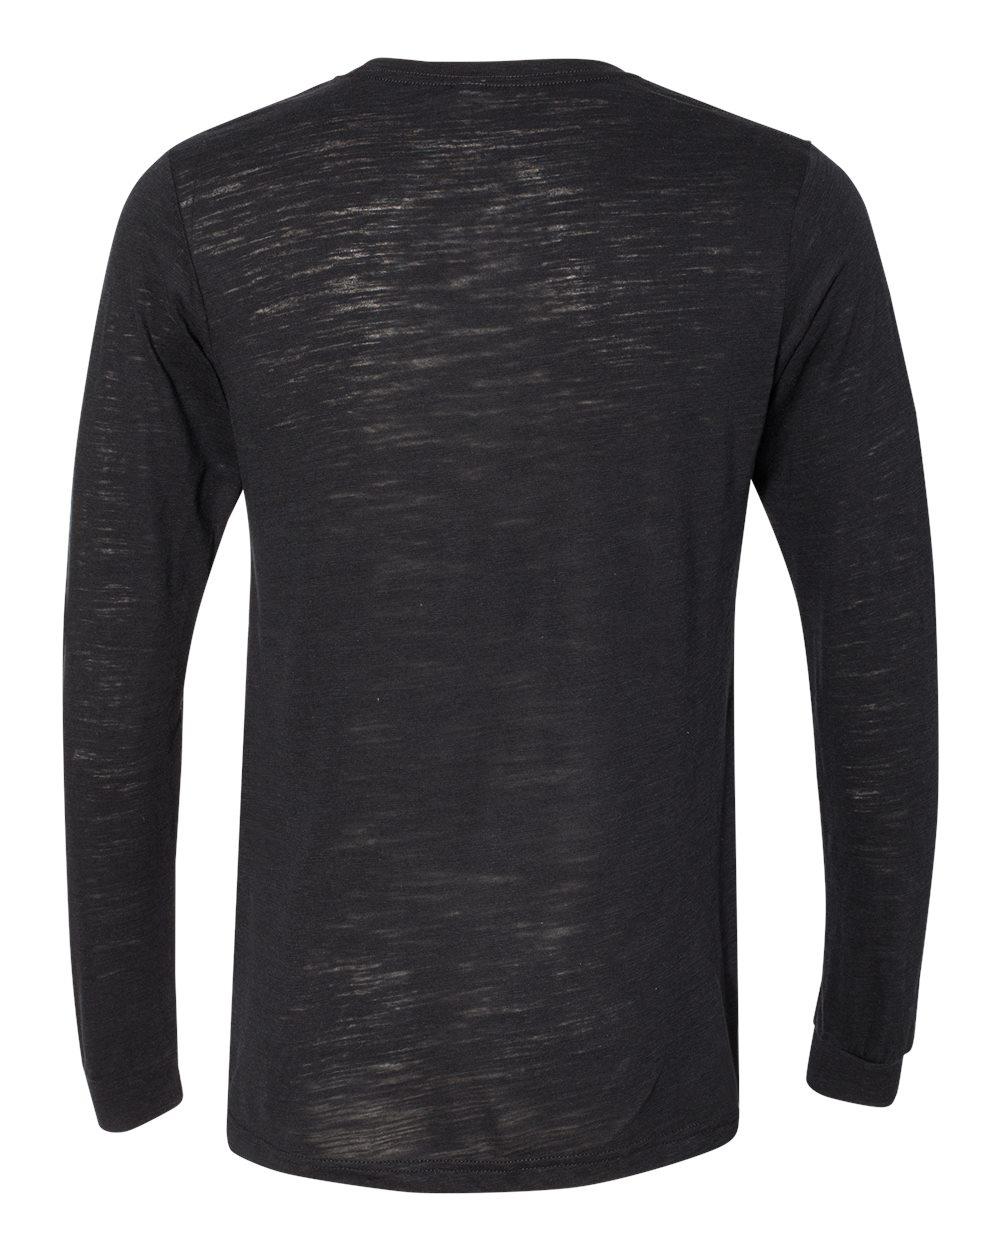 Bella-Canvas-Mens-Blank-Top-Long-Sleeve-Jersey-Tee-T-Shirt-3501-up-to-3XL thumbnail 102